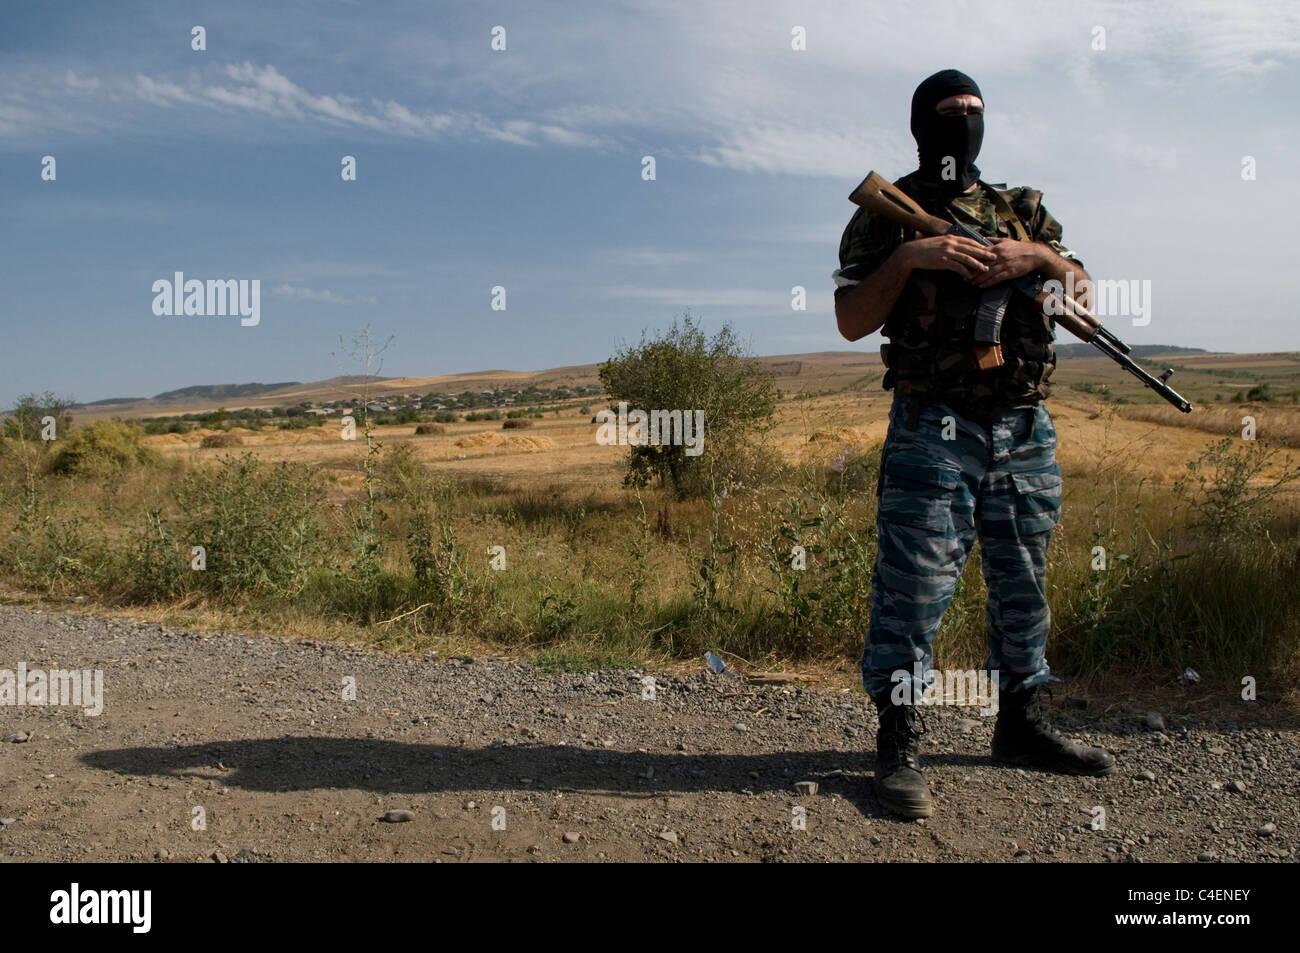 An Abkhaz militia gunman armed with a Kalashnikov AK-47 assault rifle wearing black balaclava near the city of Gori, - Stock Image